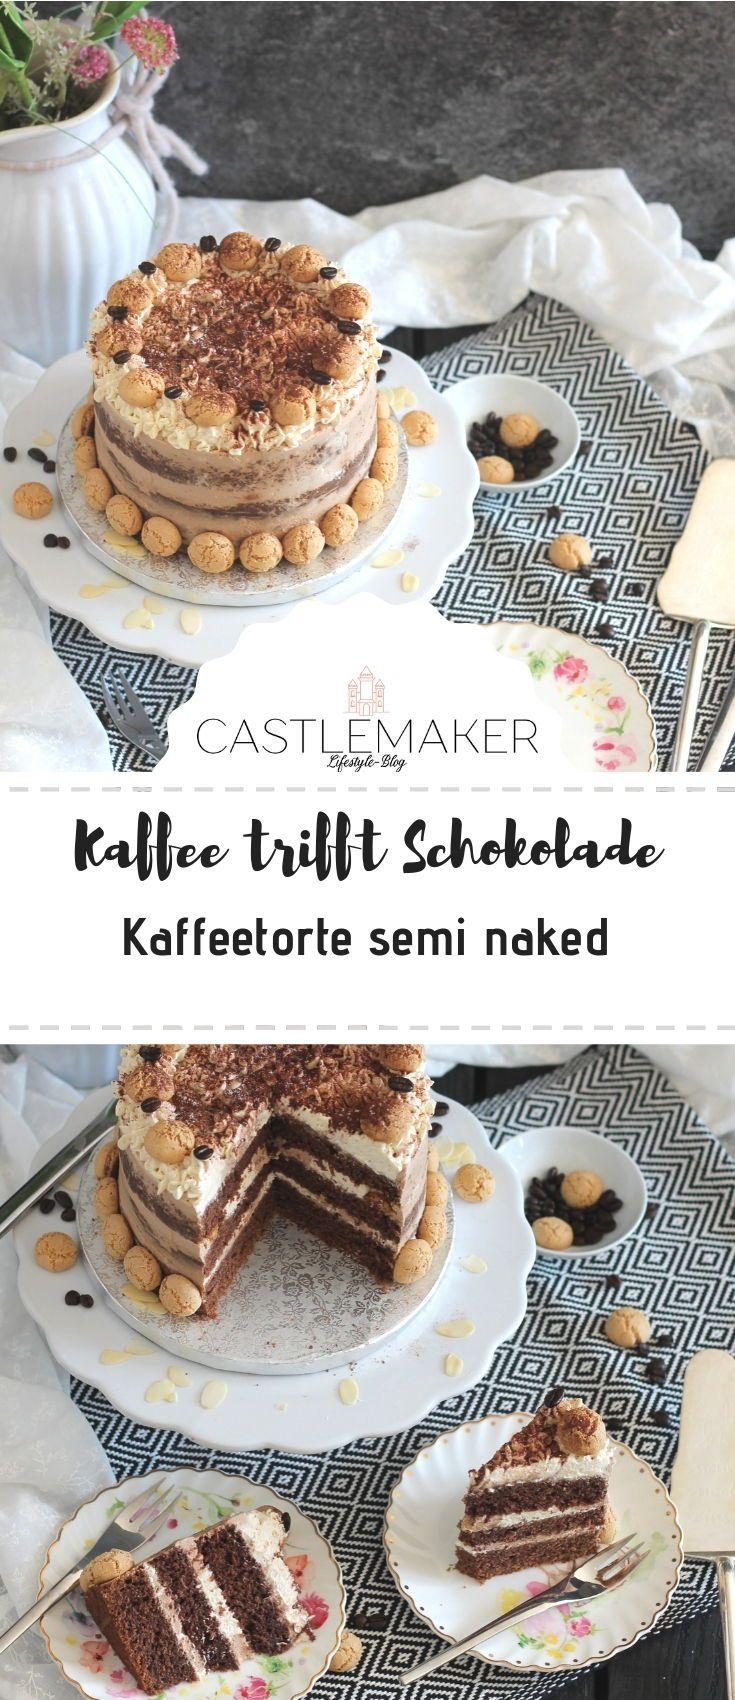 Kaffeetorte semi naked mit PIELERS - Lebensmittel direkt vom Erzeuger « CASTLEMAKER Lifestyle Blog